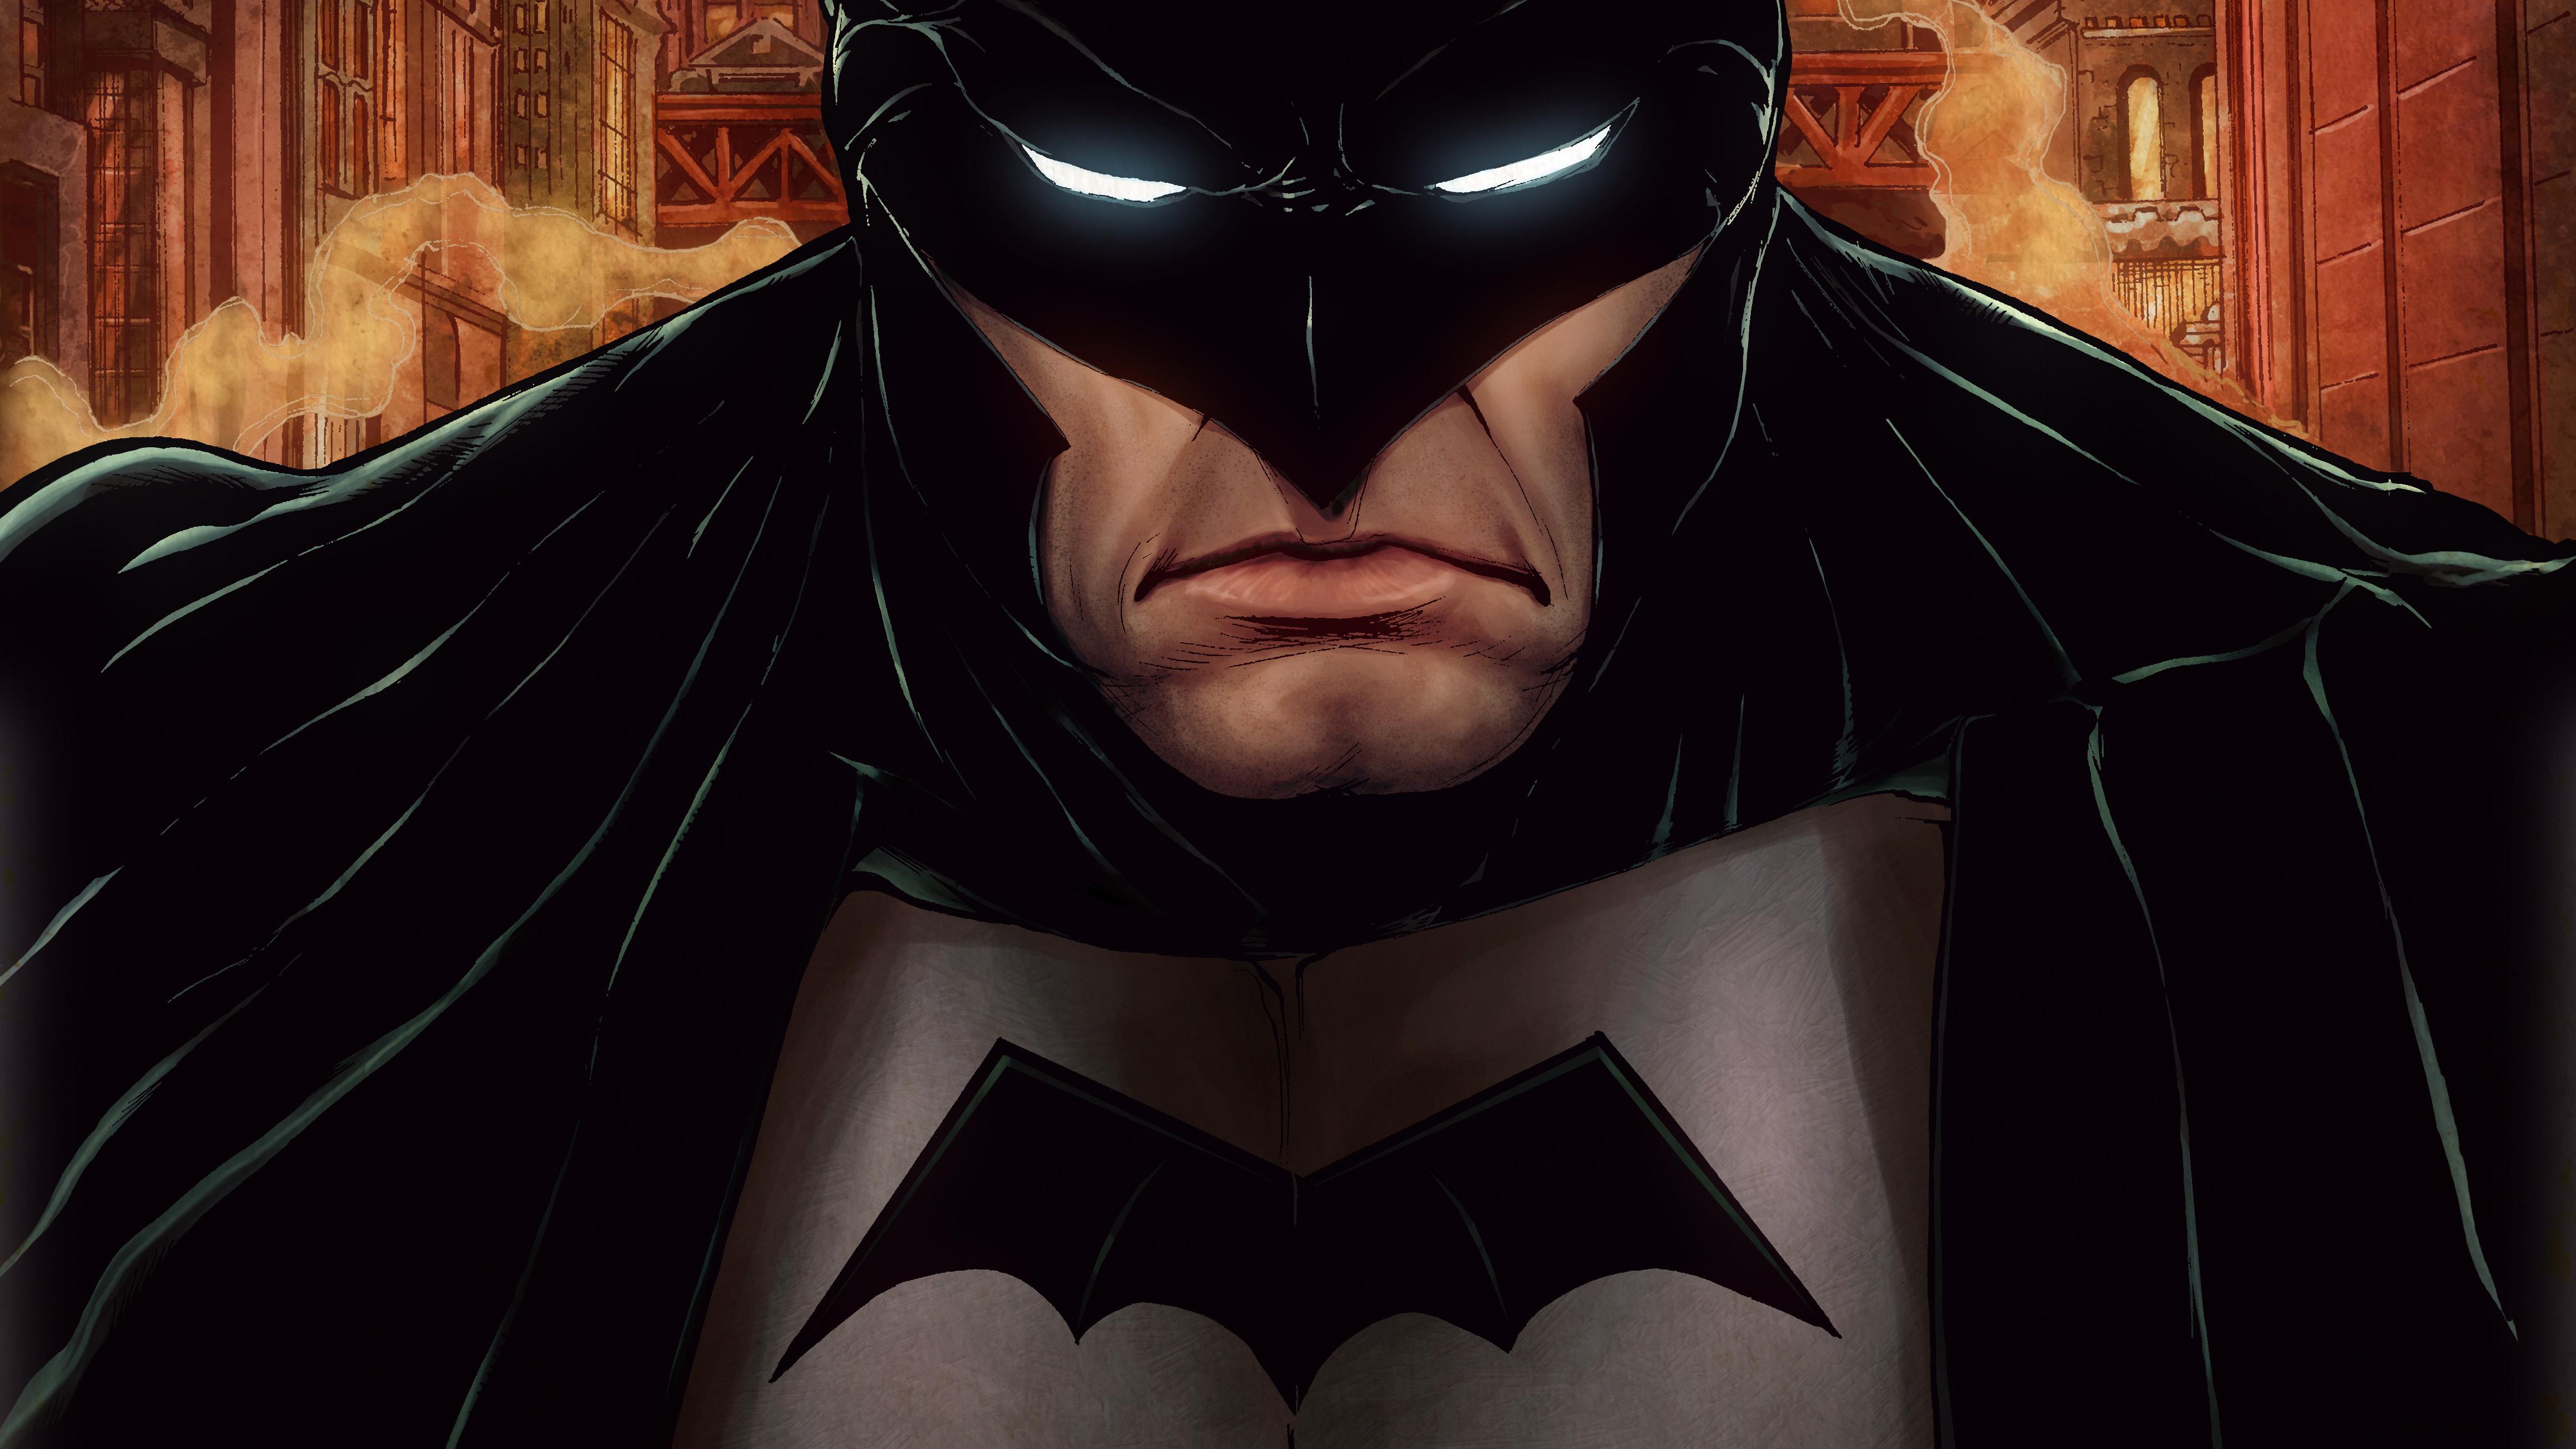 Batman New Artwork 4k, HD Superheroes, 4k Wallpapers ...